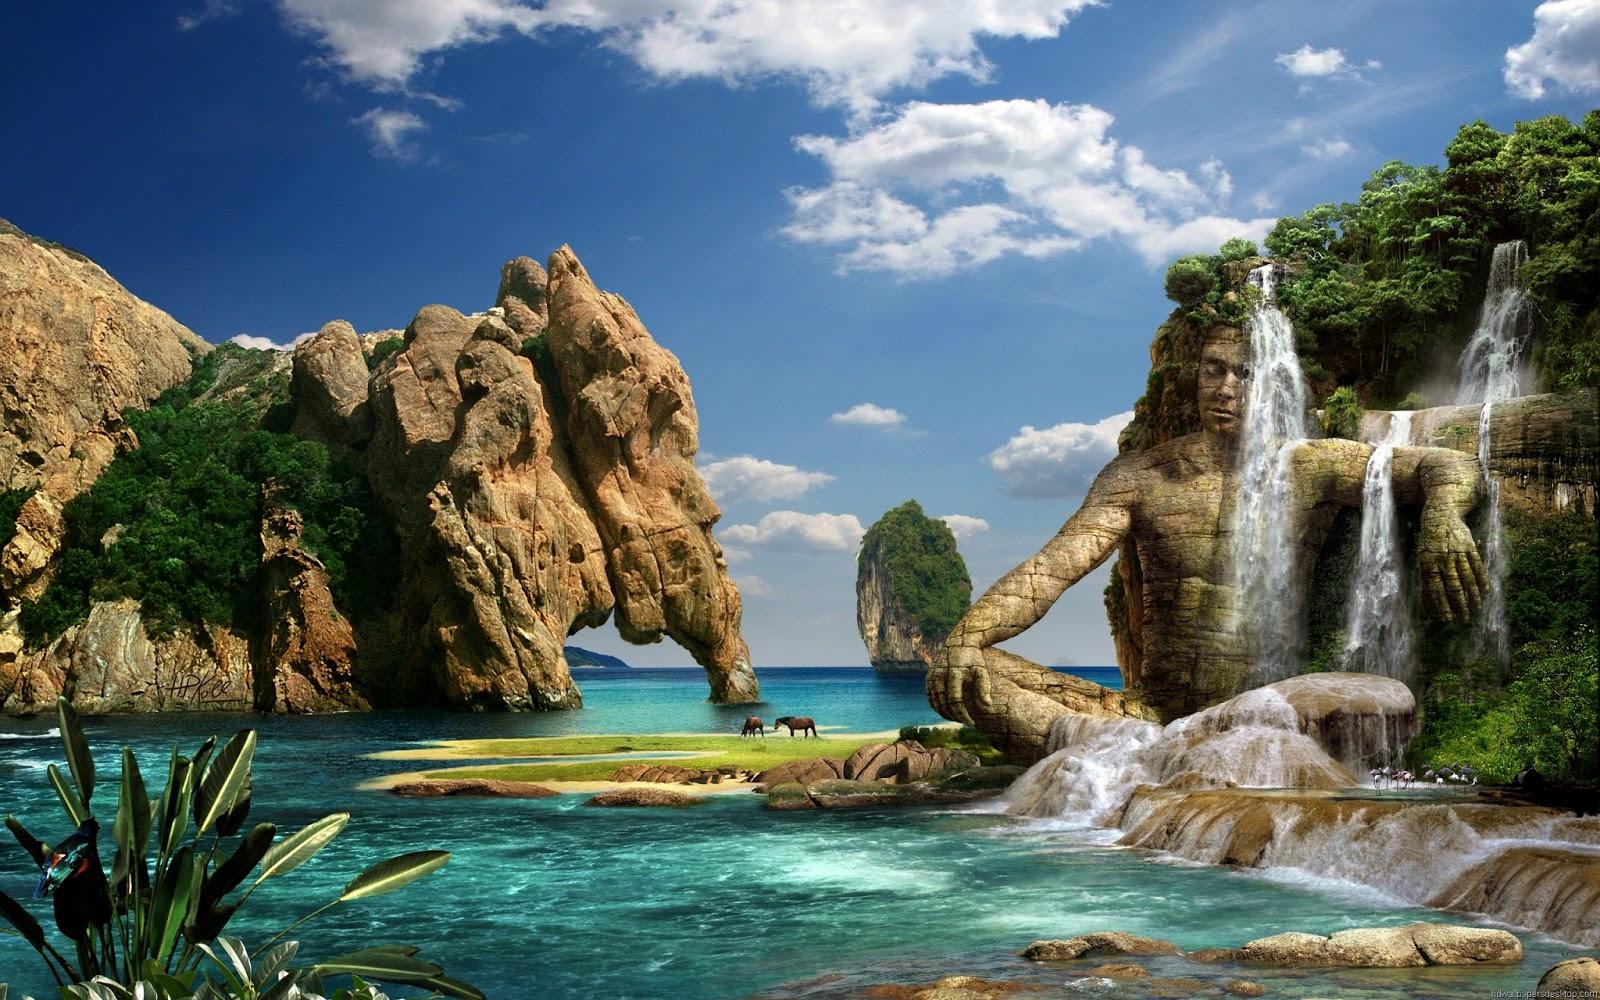 Beautiful Nature Images Hd 1600x1000 Download Hd Wallpaper Wallpapertip